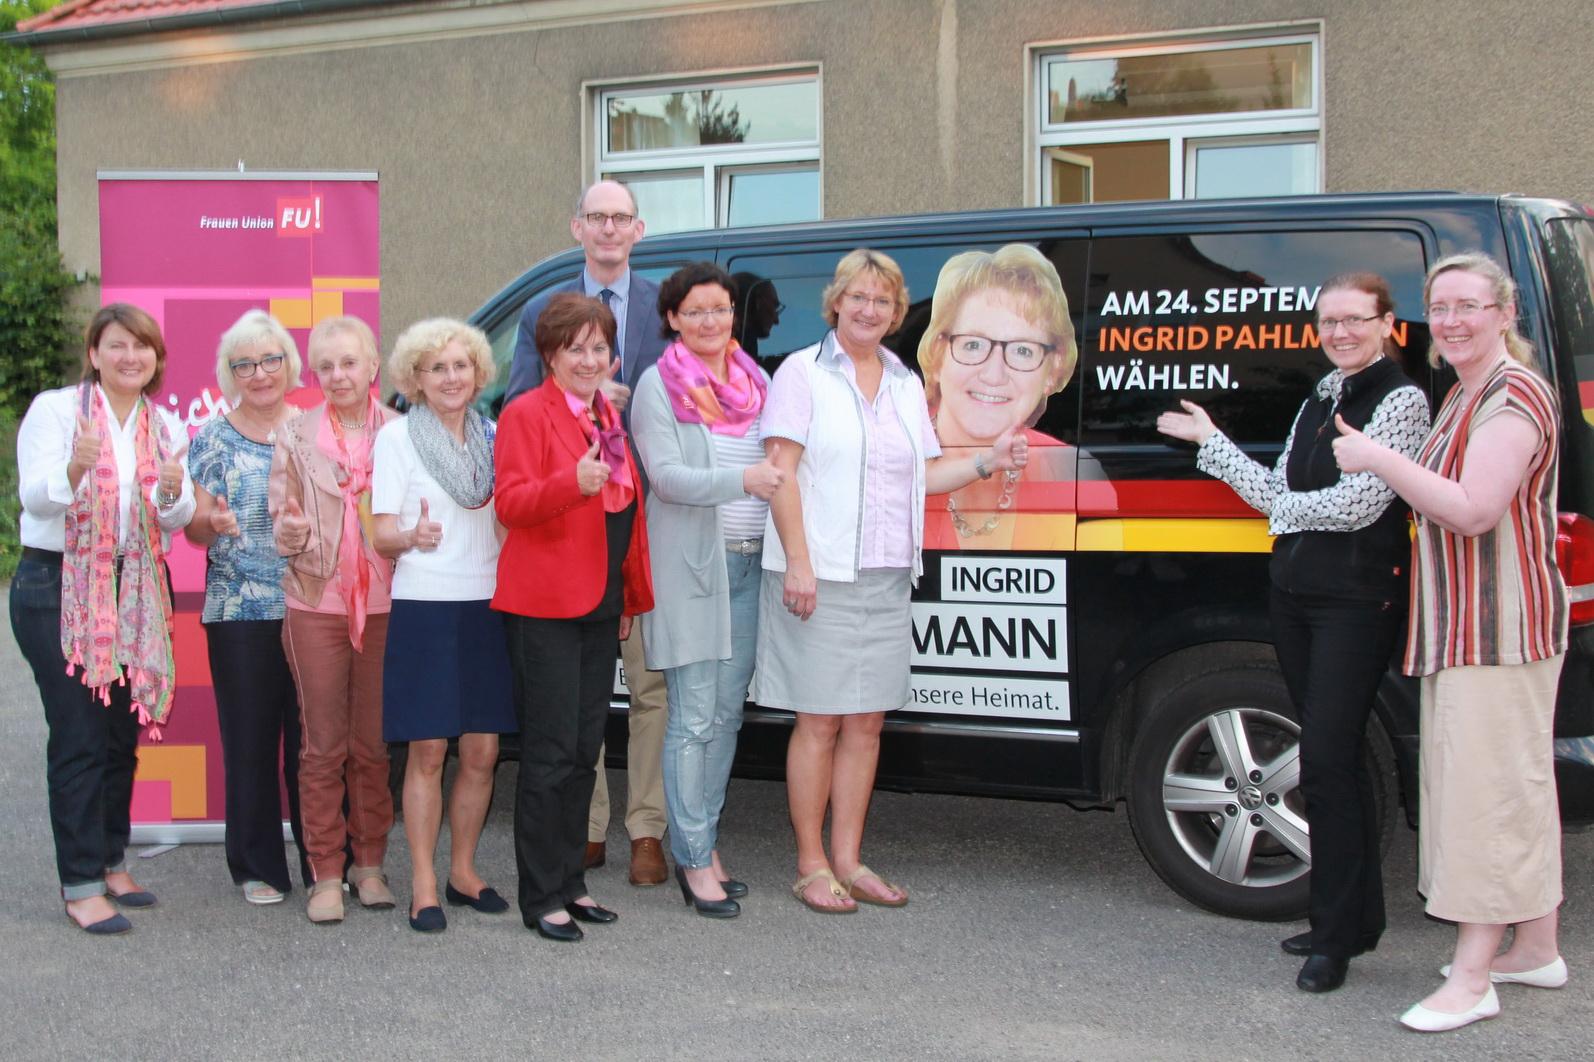 CDU Frauenunion Landesverband Braunschweig